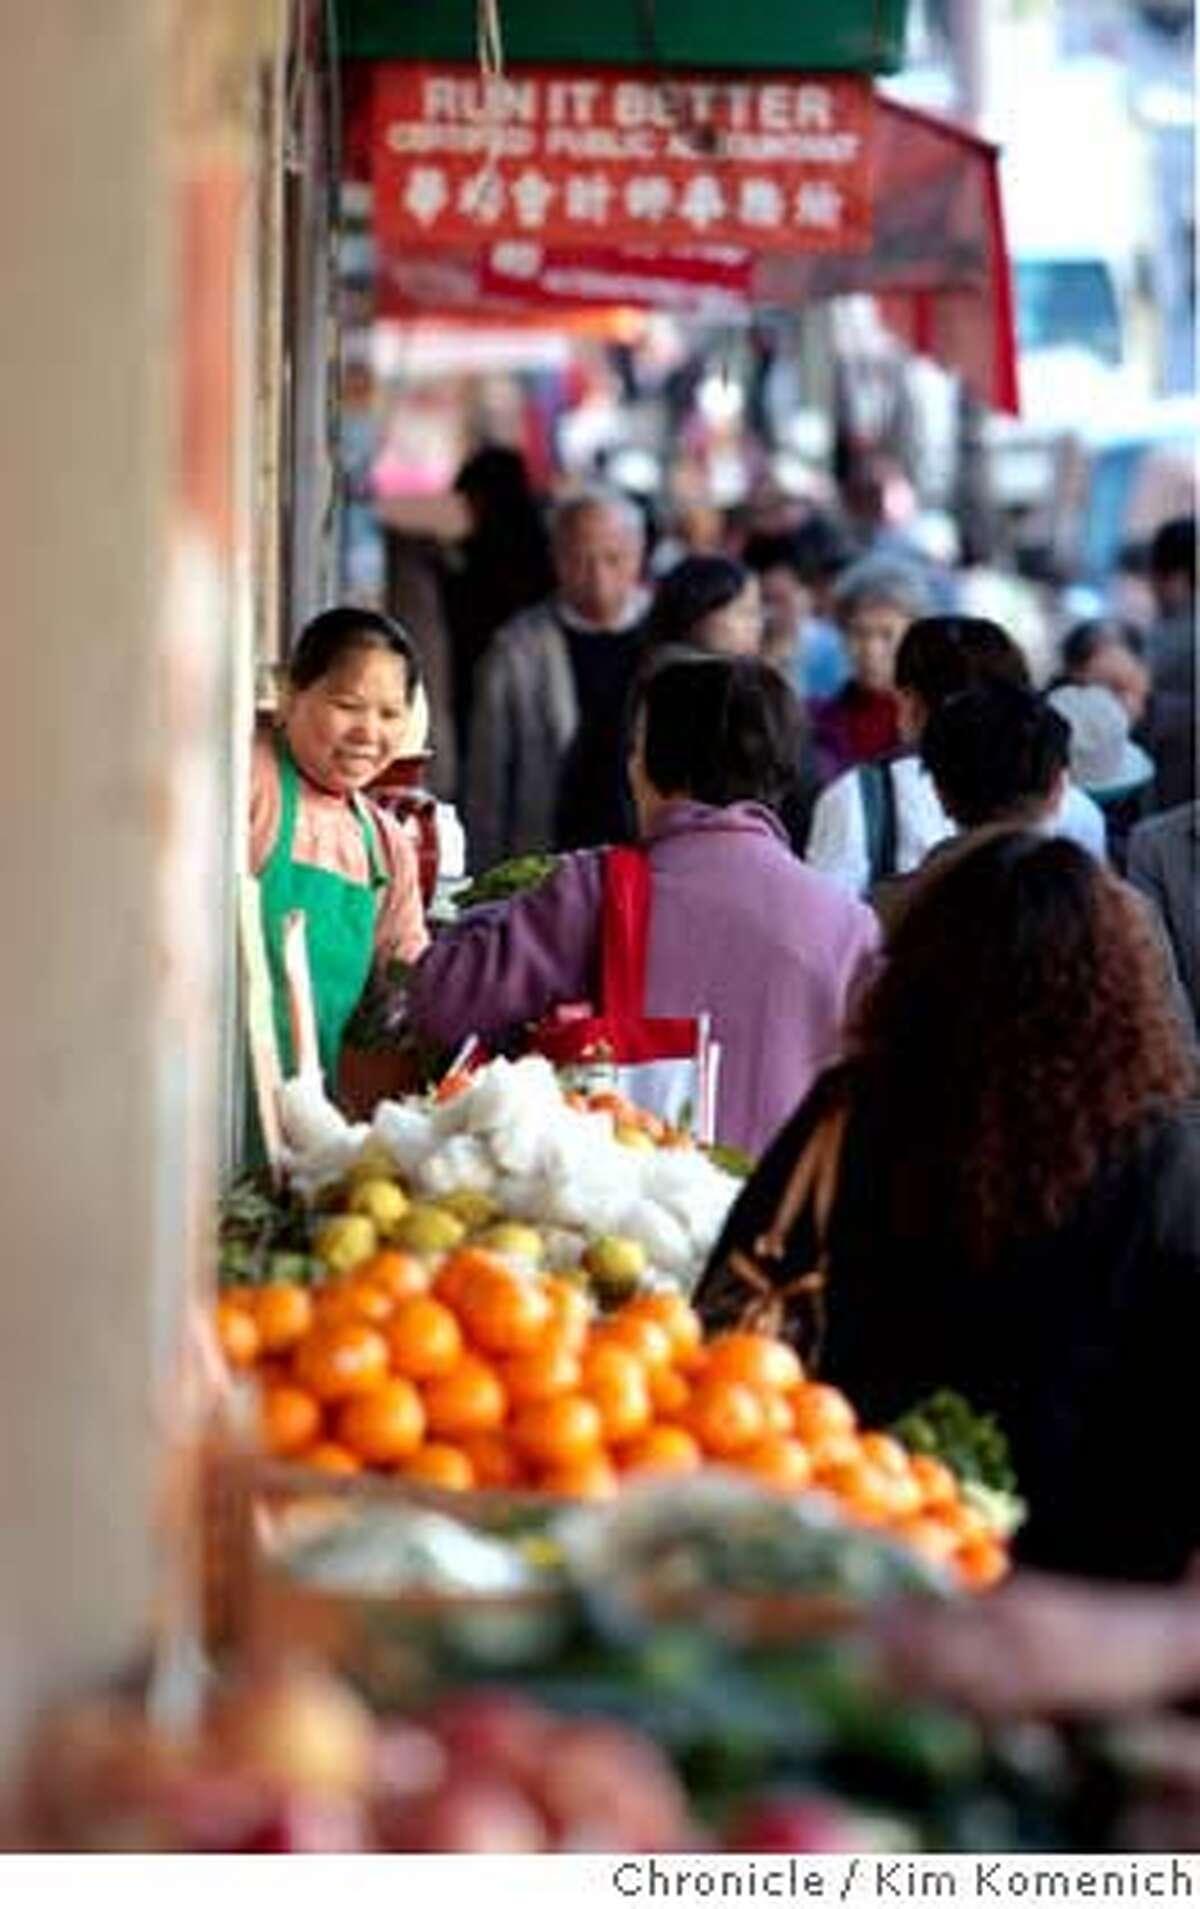 A merchant greets customers on Stockton Street near Washington Photo by Kim Komenich/San Francisco Chronicle